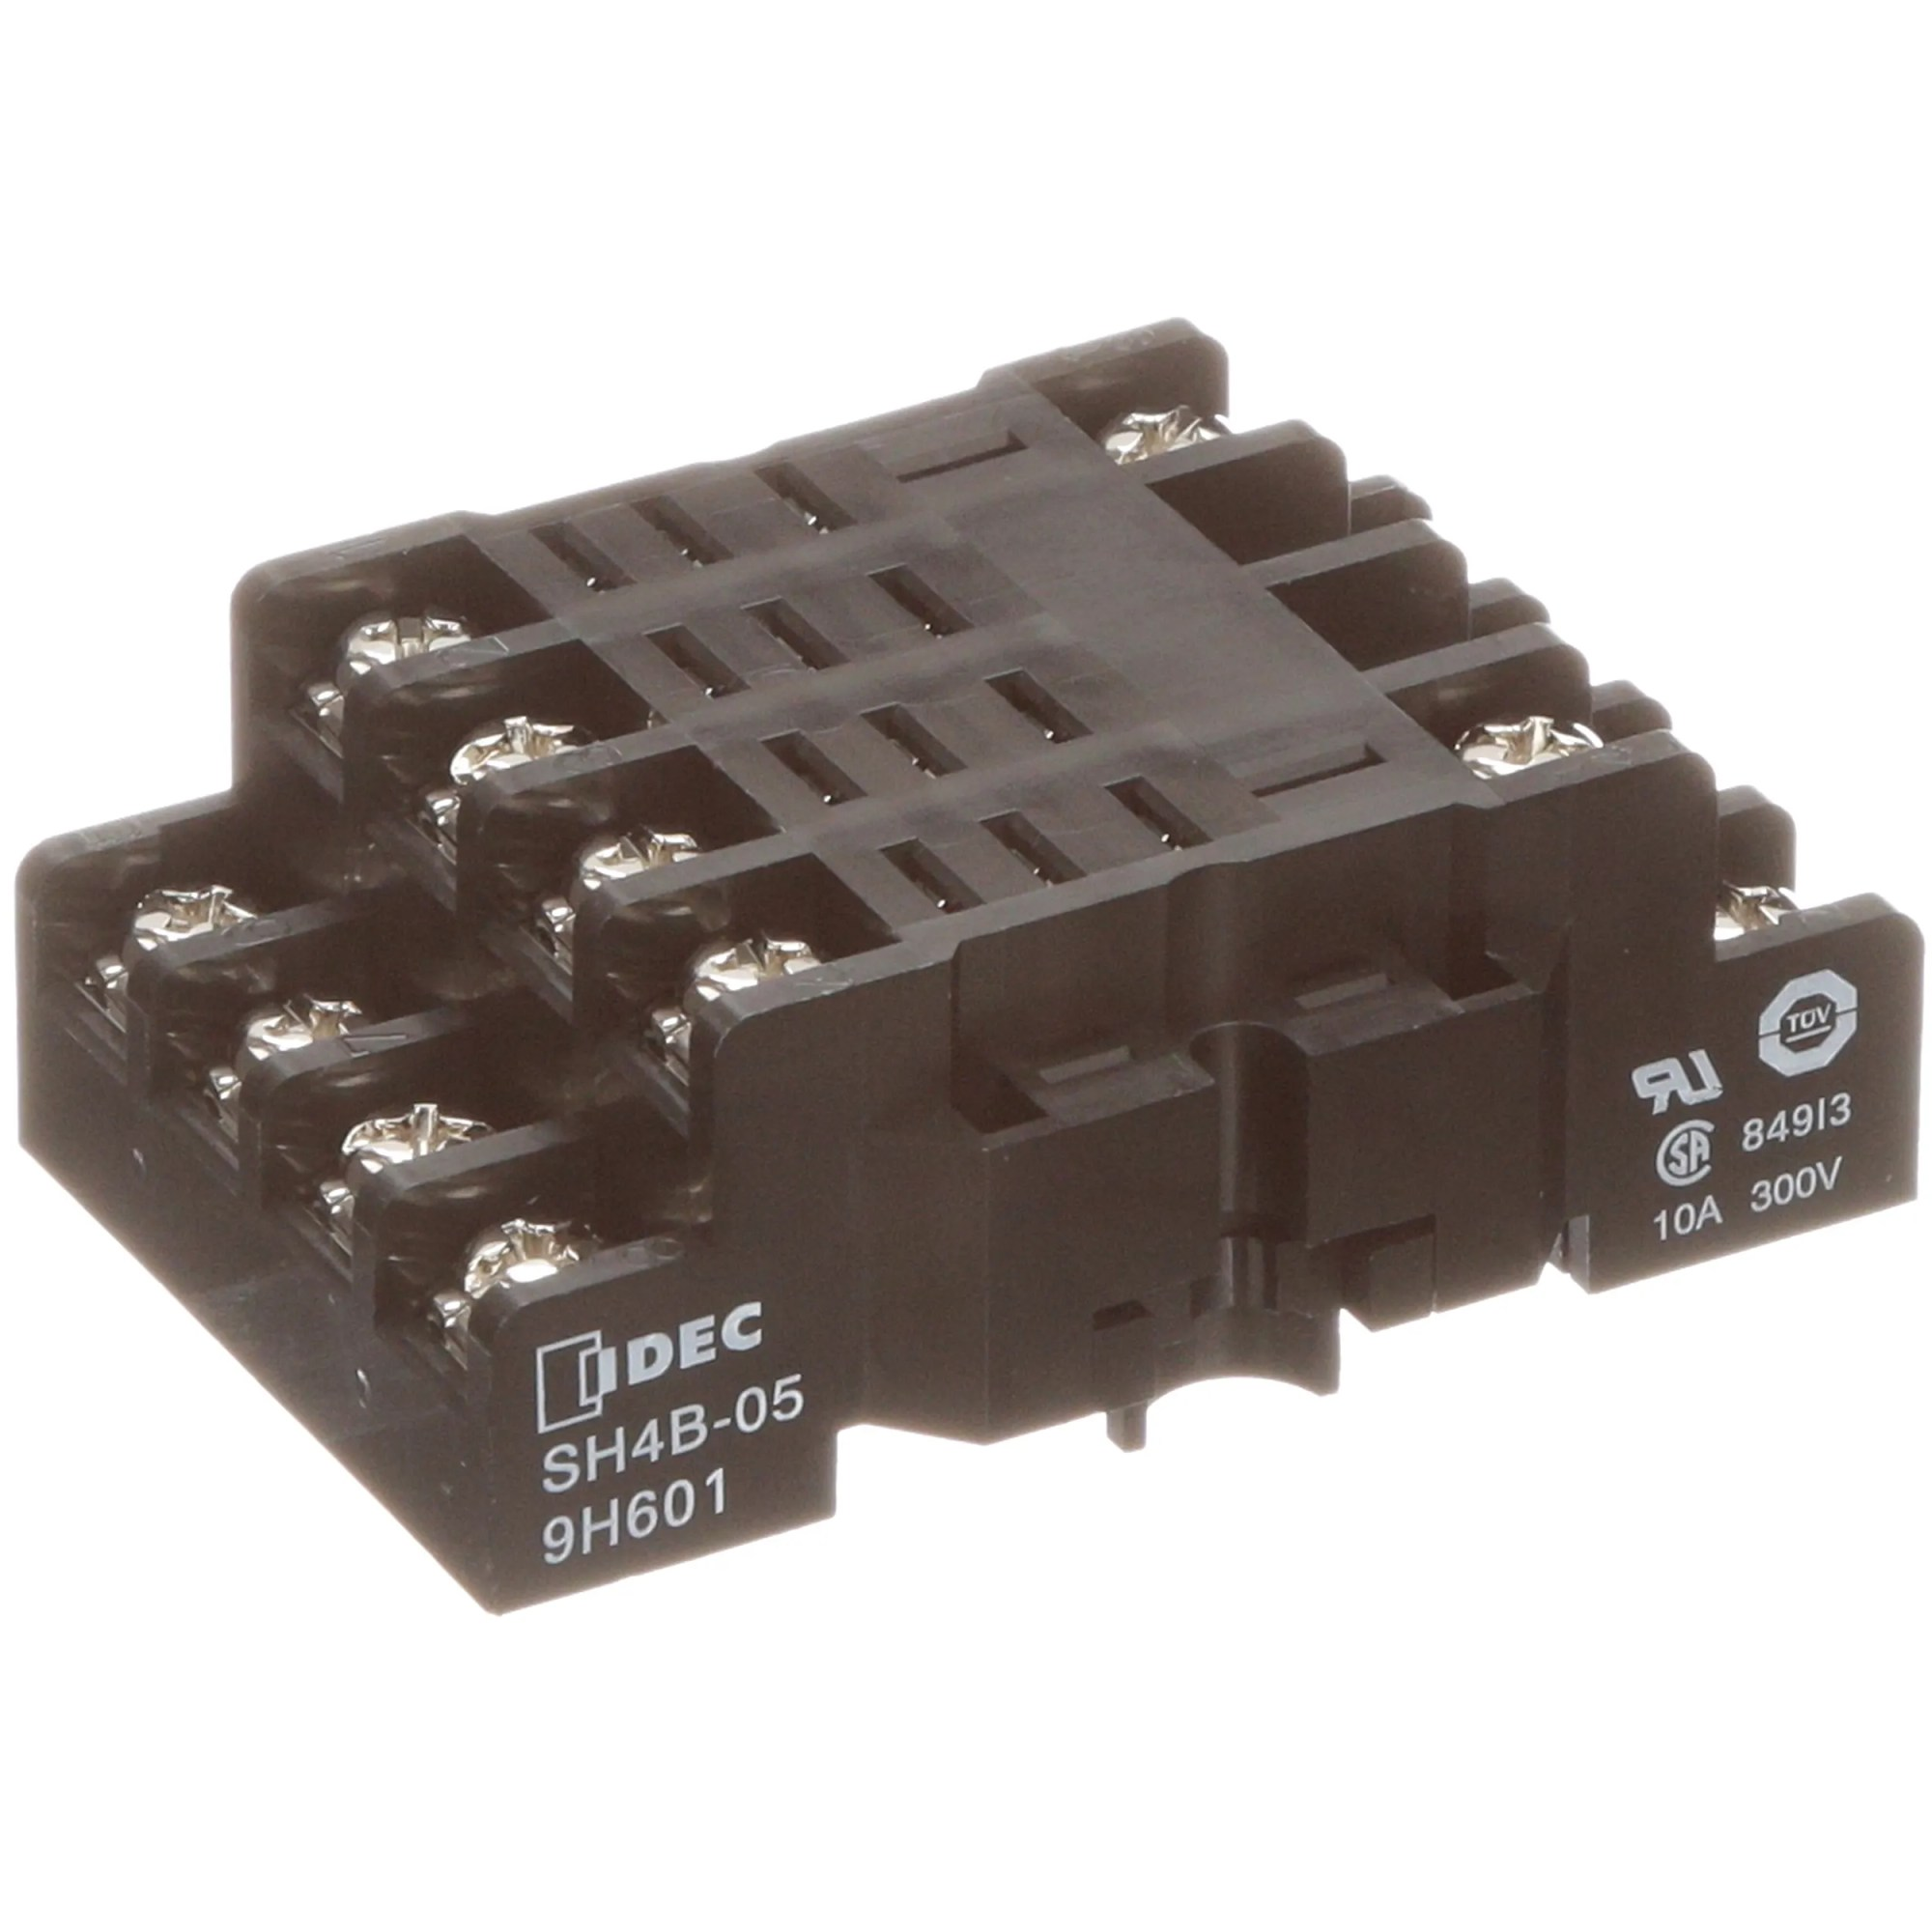 hight resolution of idec corporation sh4b 05 socket relay 14 4 din rail 10 a 100 megohms insulation resistance m3 5 allied electronics automation